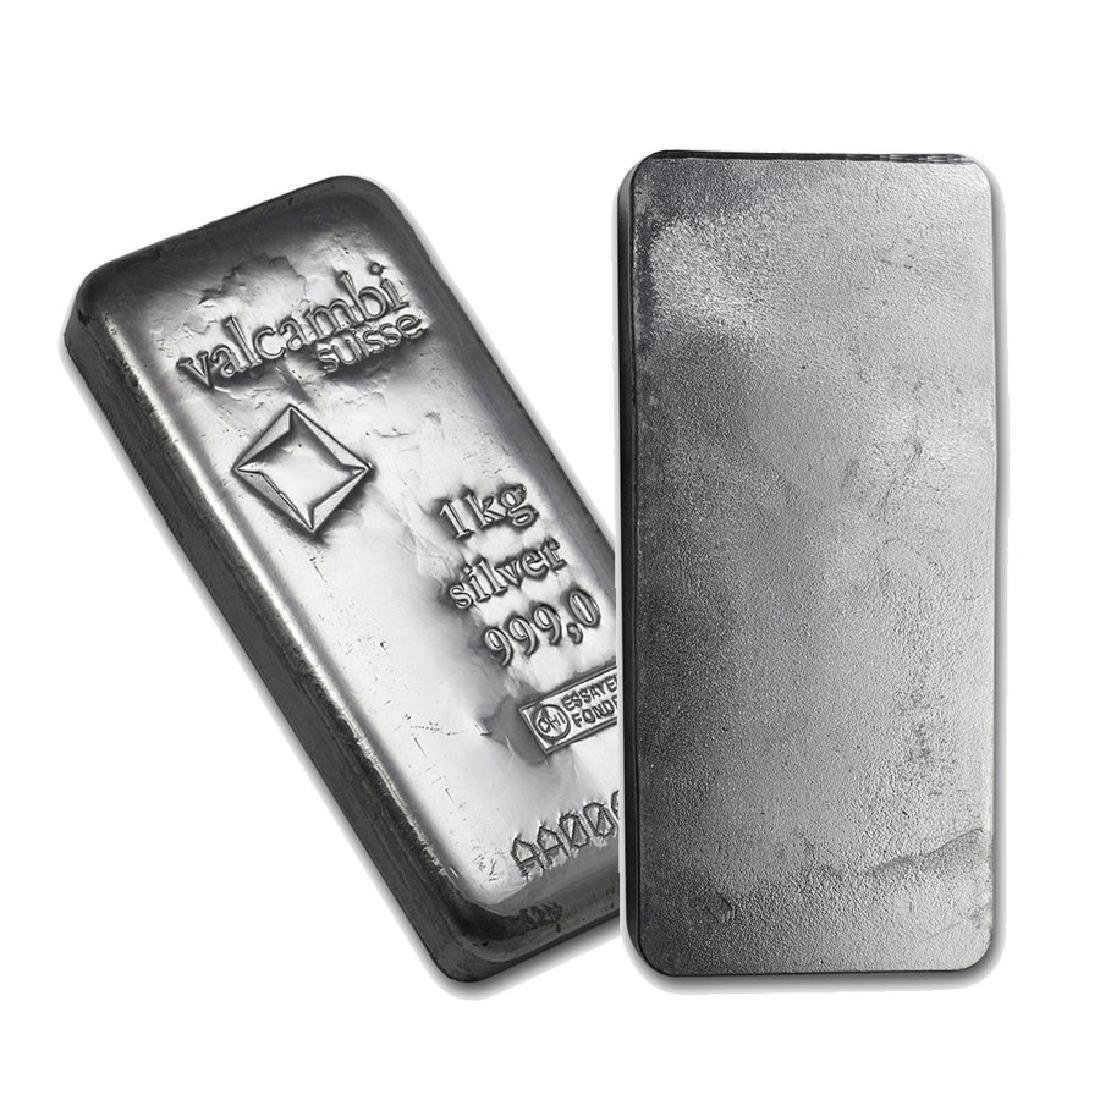 One piece 1 kilo 0.999 Fine Silver Bar Valcambi with